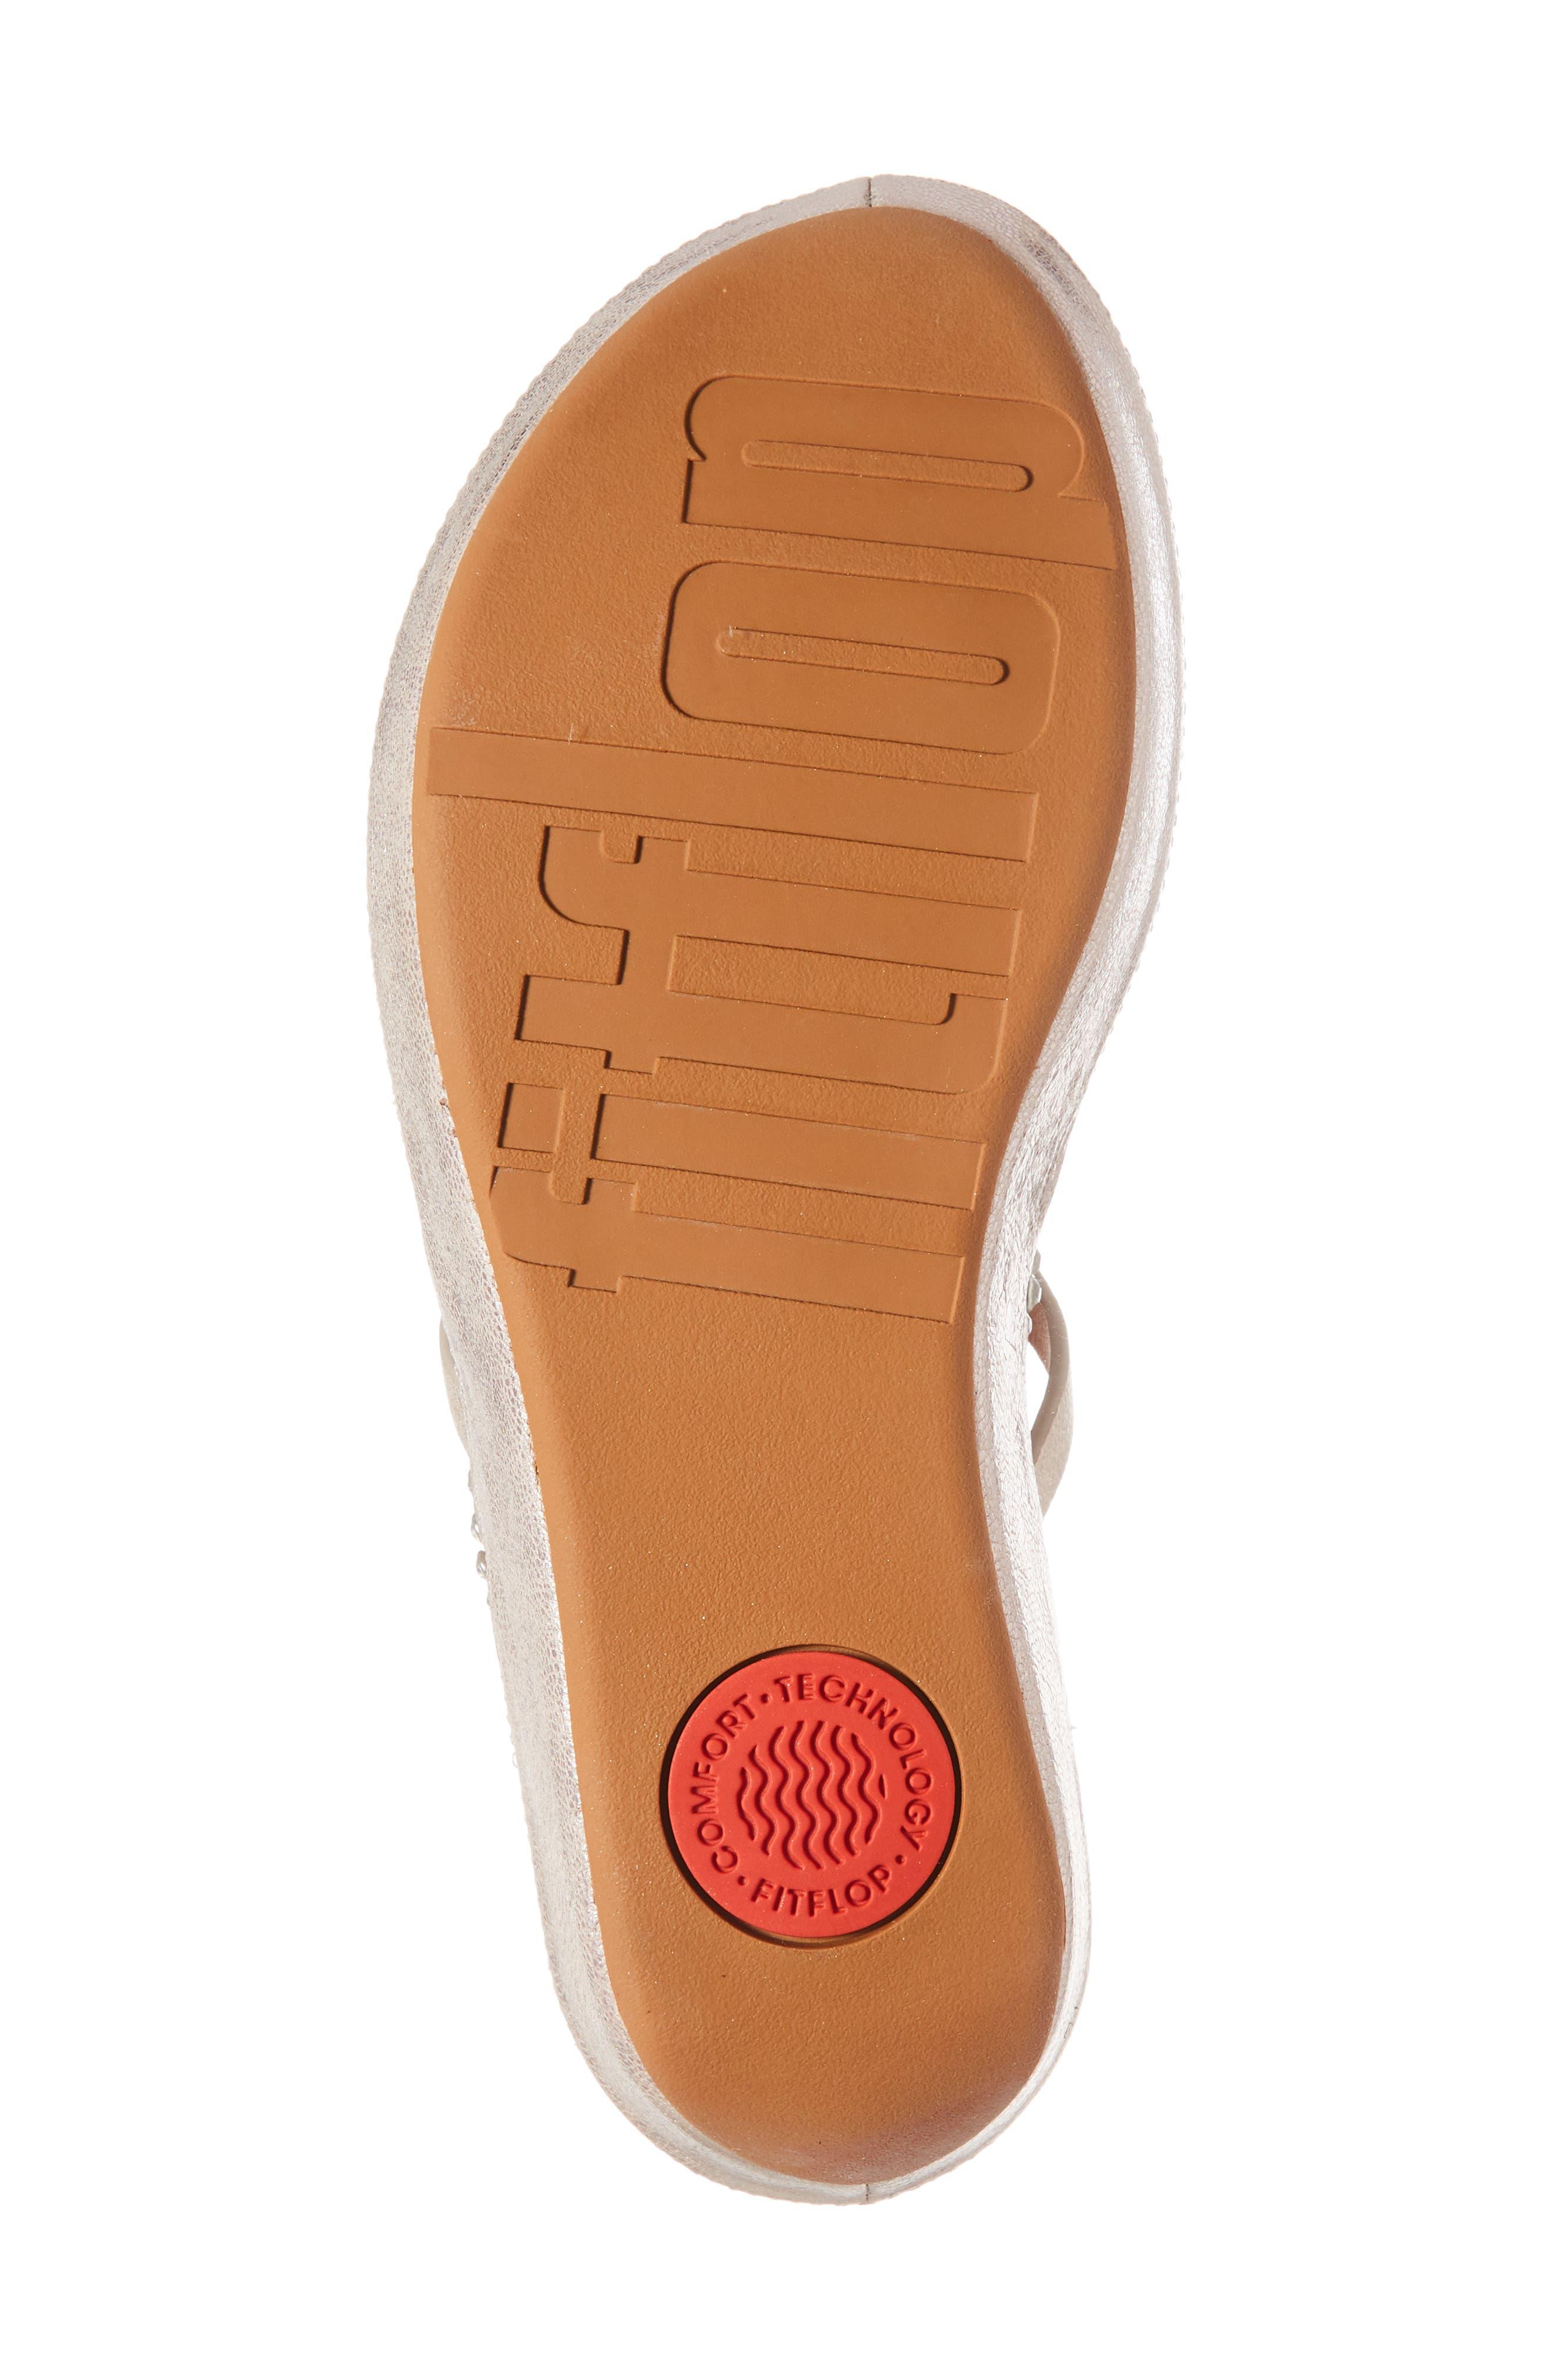 Linny Embellished Slide Sandal,                             Alternate thumbnail 6, color,                             Blush/ Metallic Nude Leather